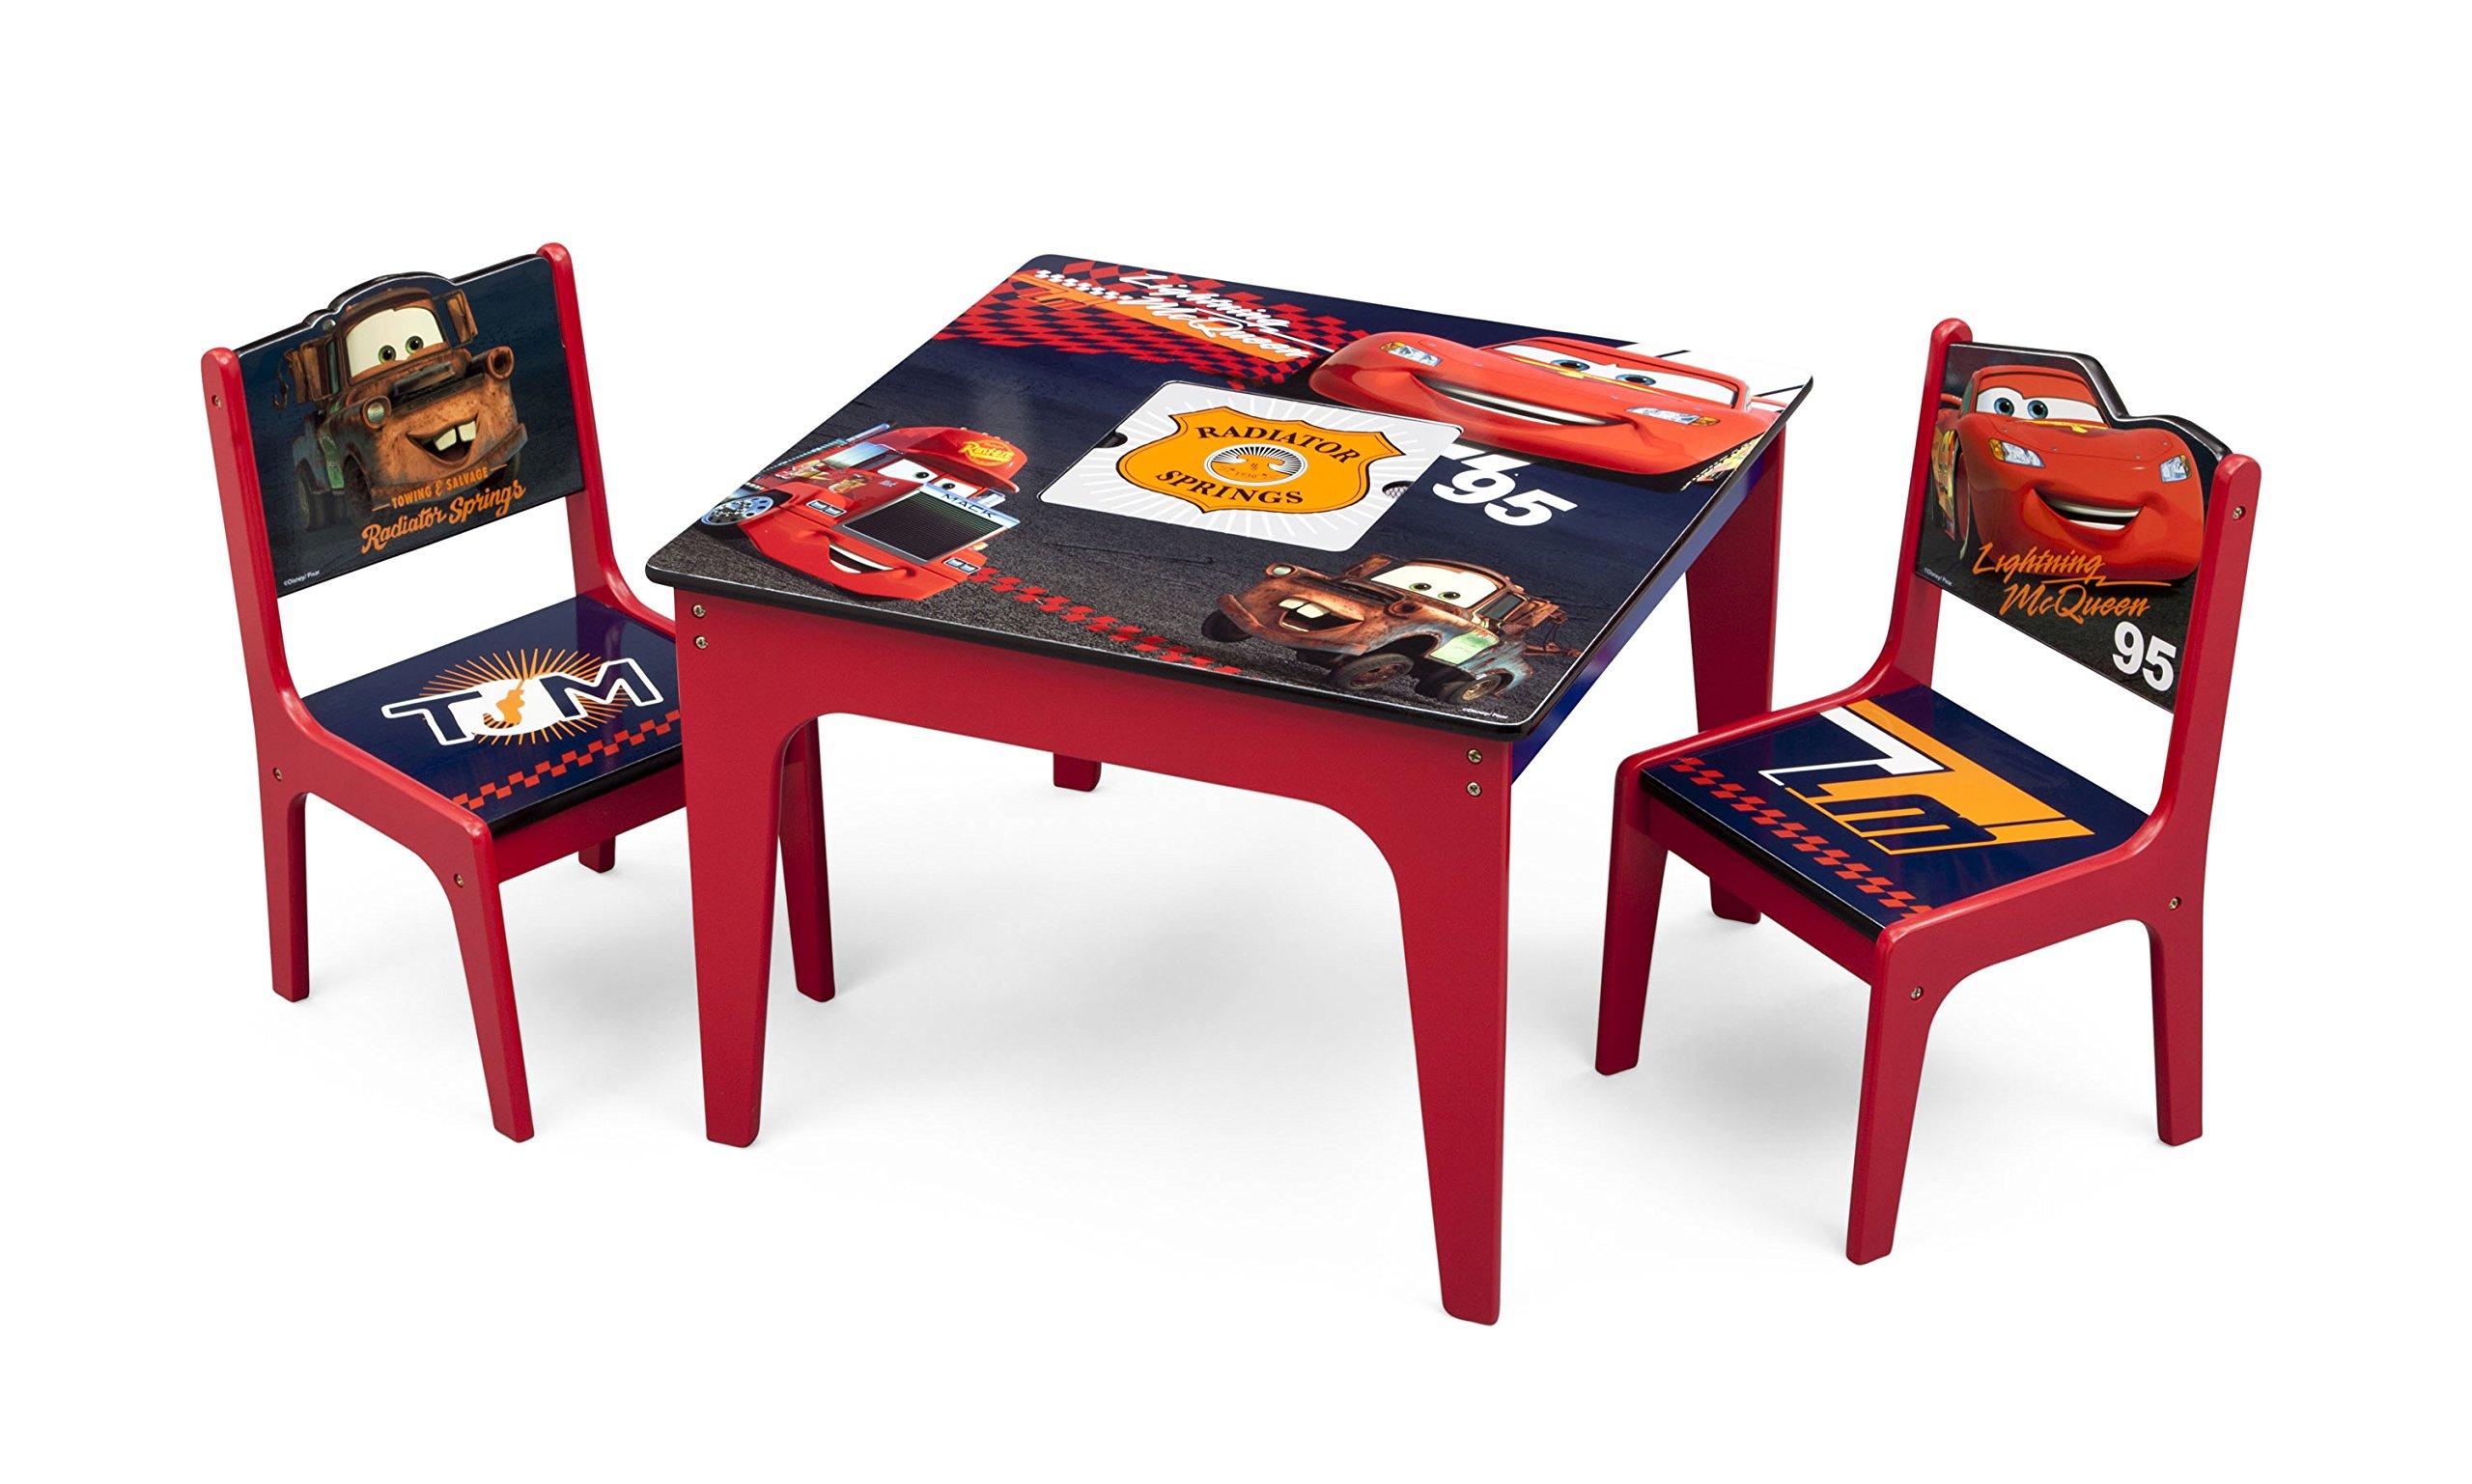 Delta Children Deluxe Table & Chair Set with Storage, Disney/Pixar Cars